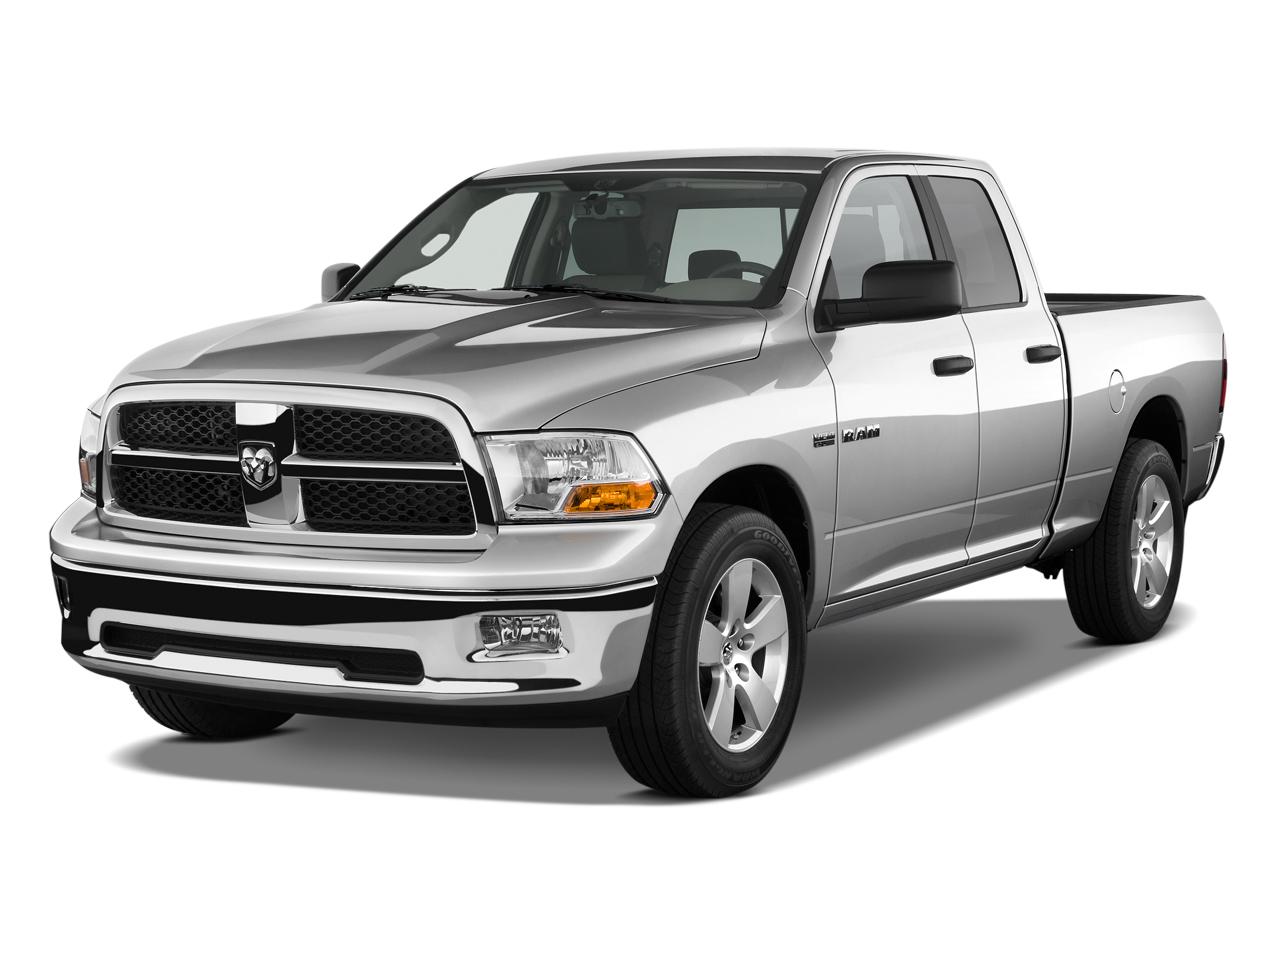 dodge trucks 2012 most wanted cars. Black Bedroom Furniture Sets. Home Design Ideas